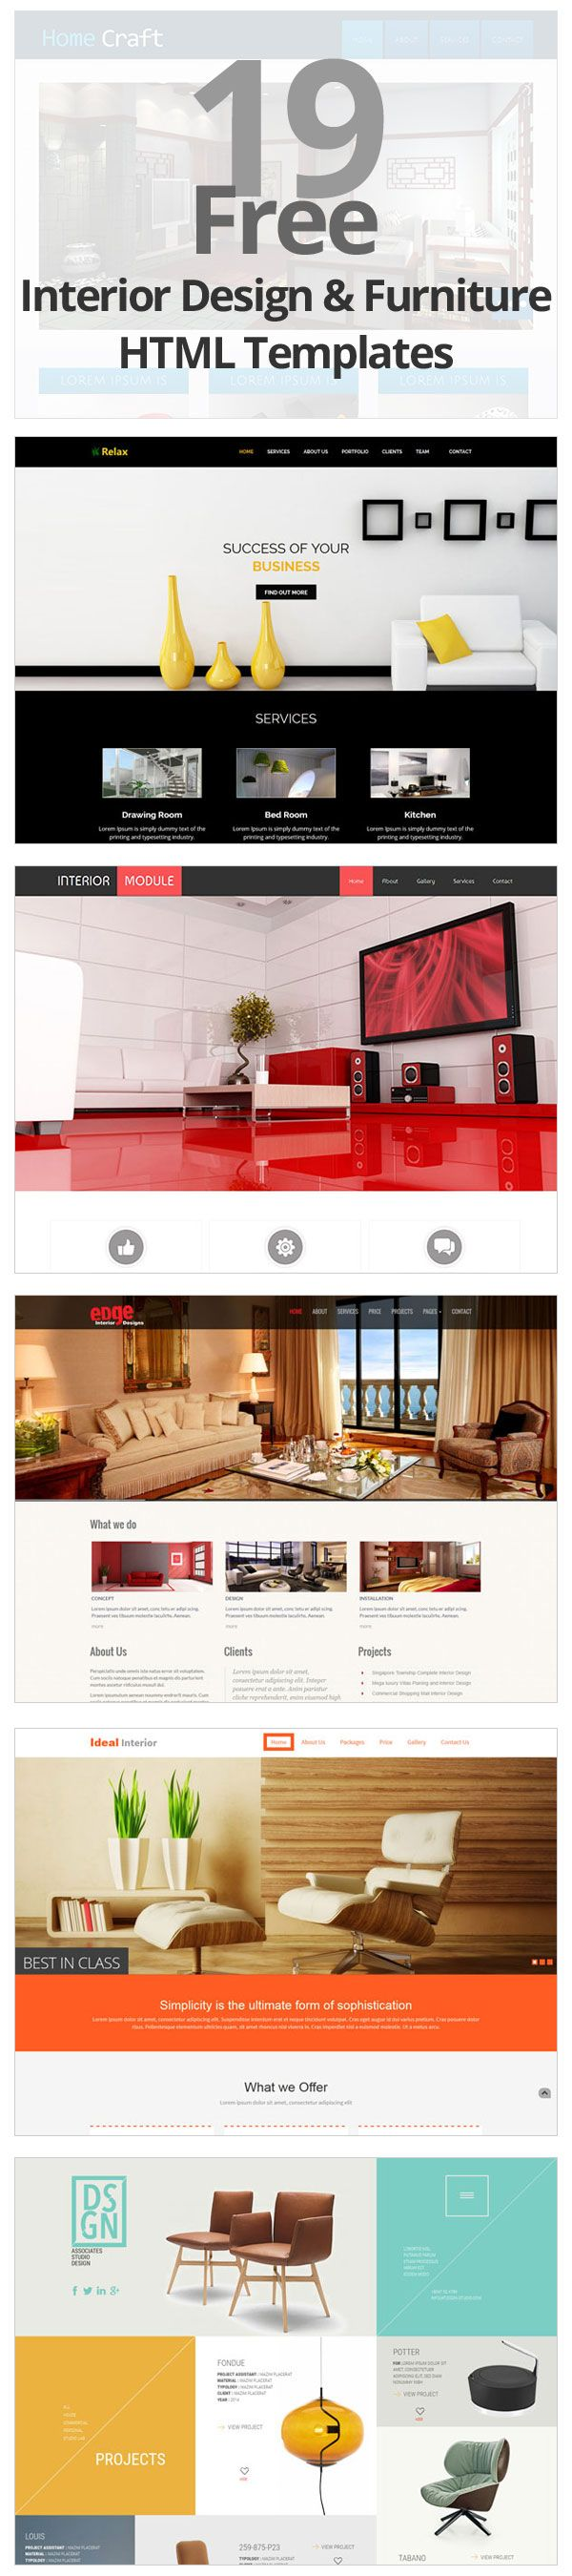 19 Free Interior Design and Furniture Website Templates